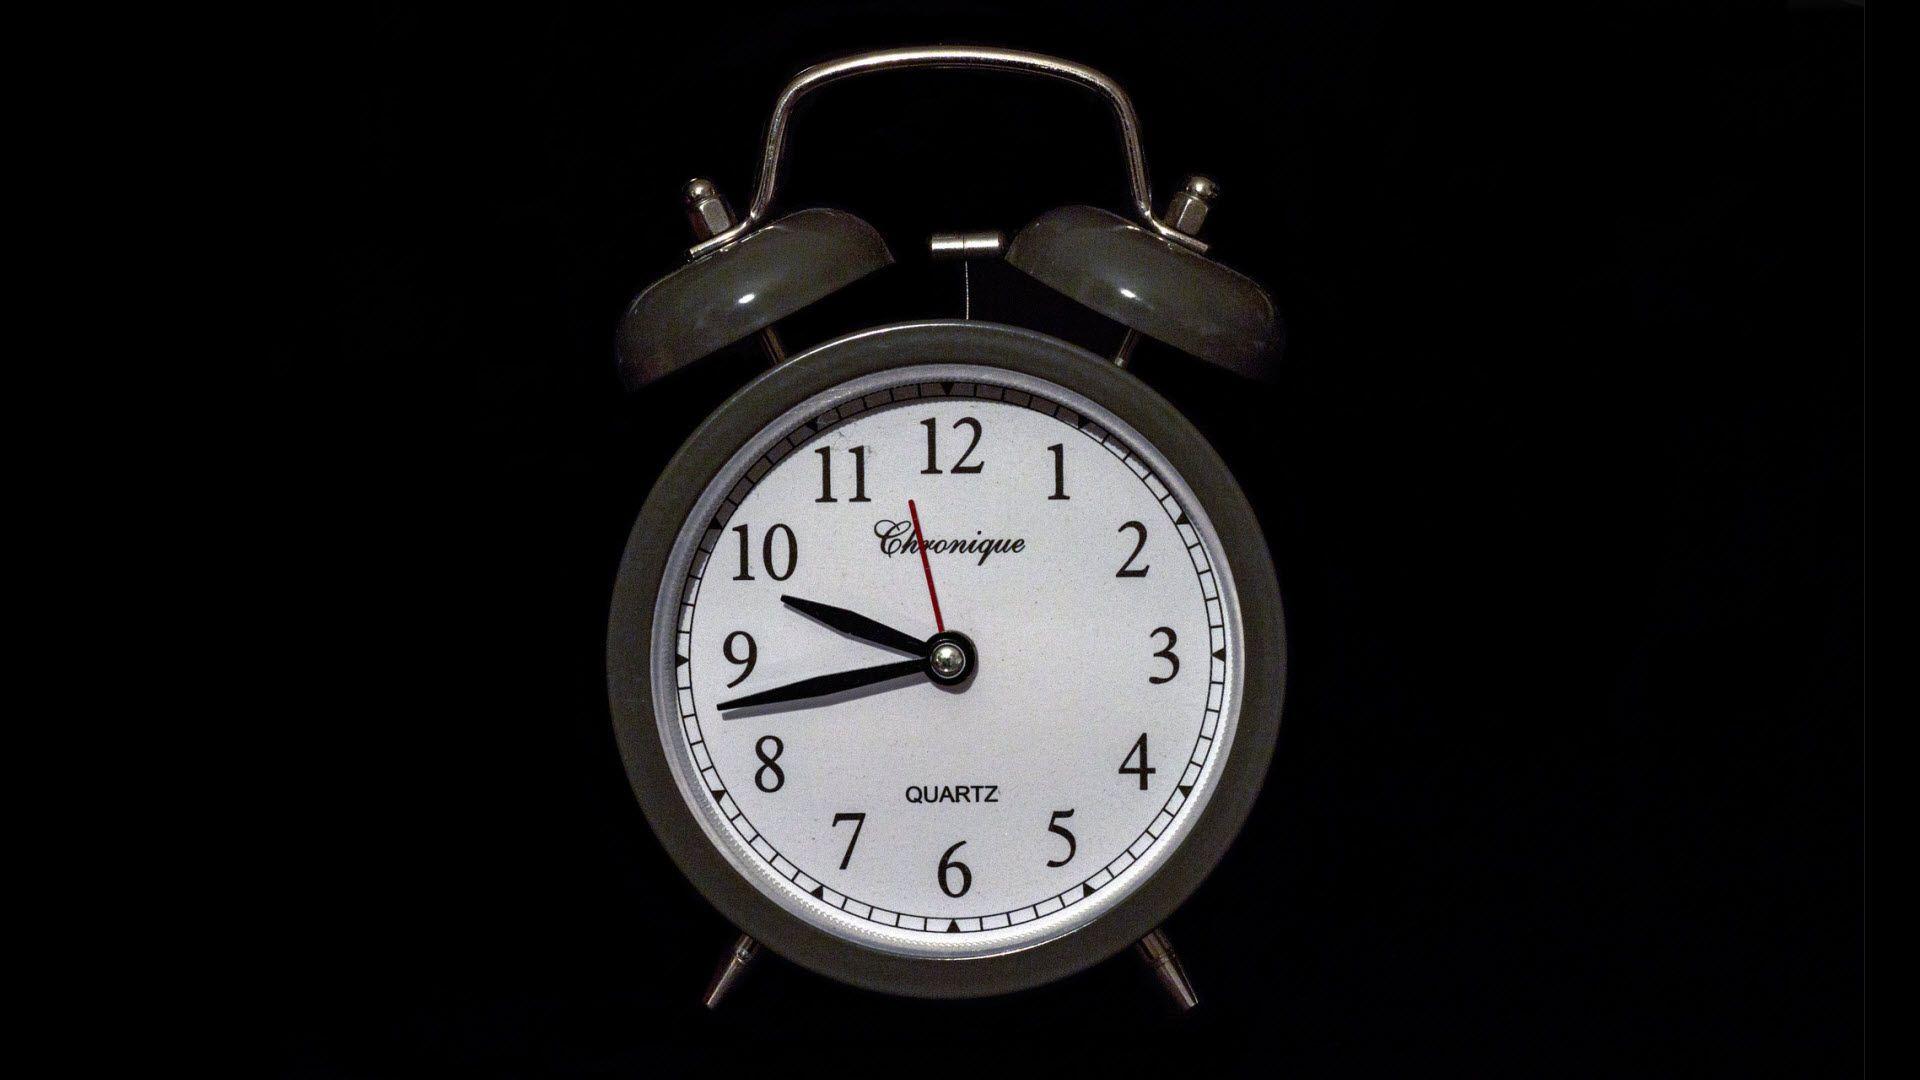 Carlos Aviles On Twitter Clock Search Ads Alarm Clock Hd wallpaper alarm clock dial time